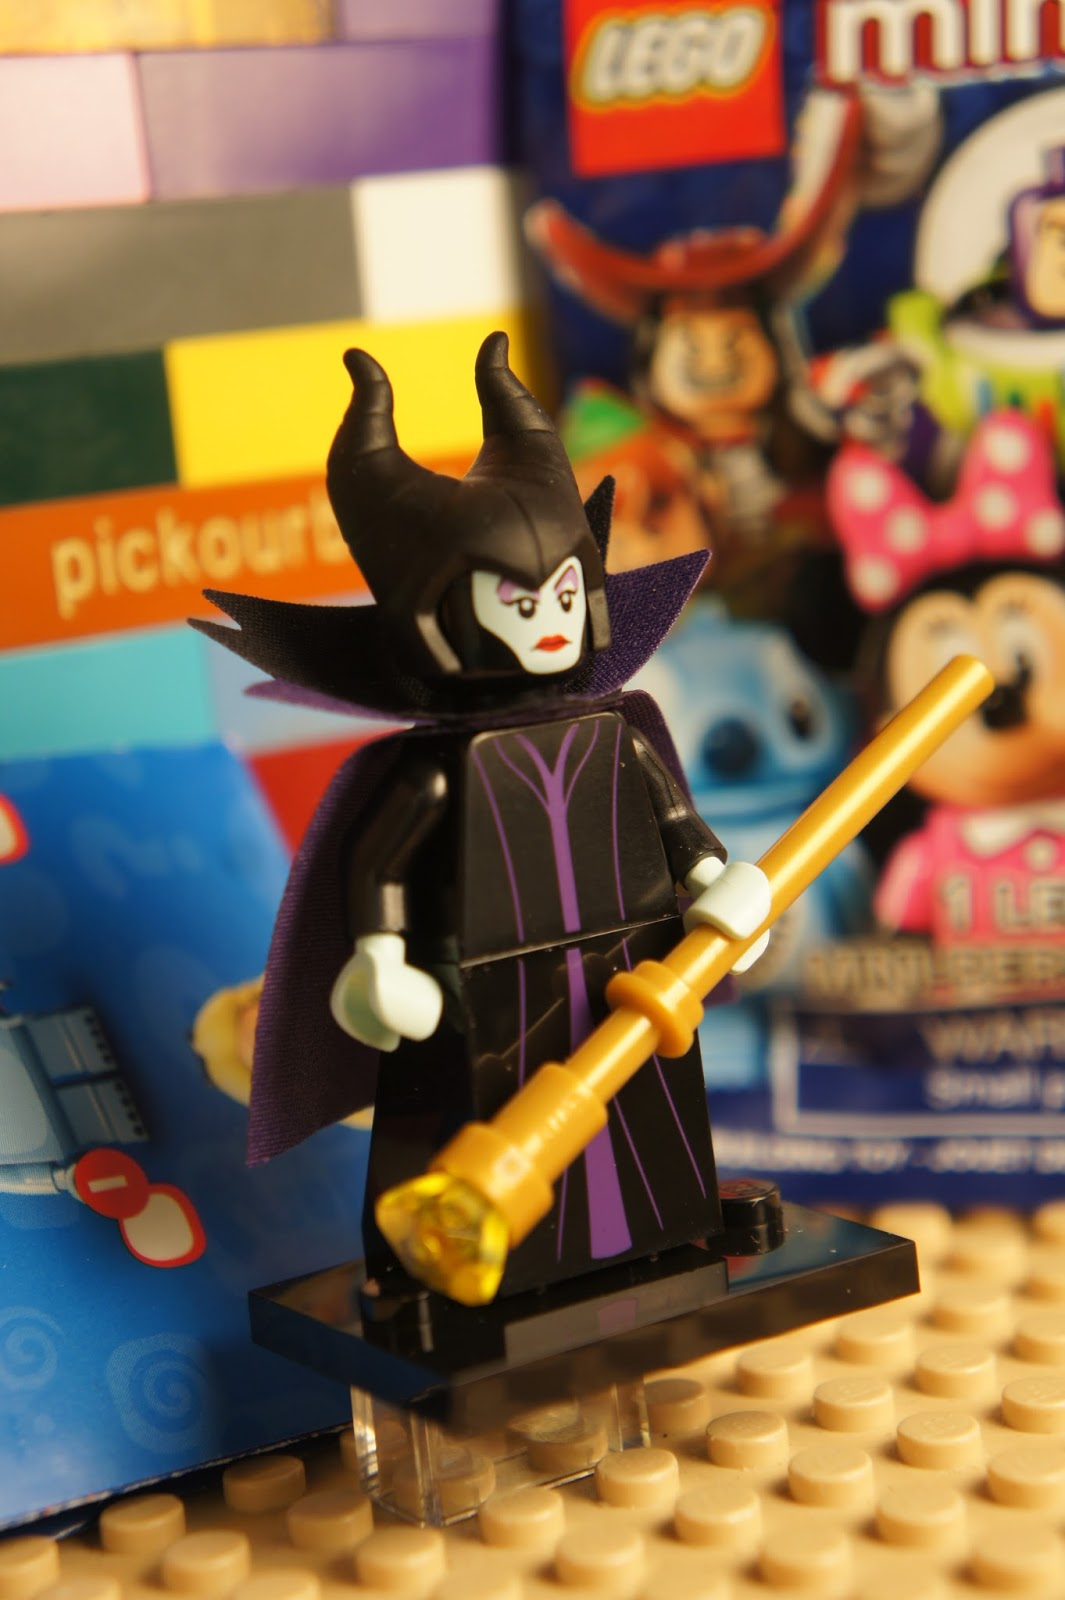 Lego Maleficent Minifigure LEGO Disney 710...